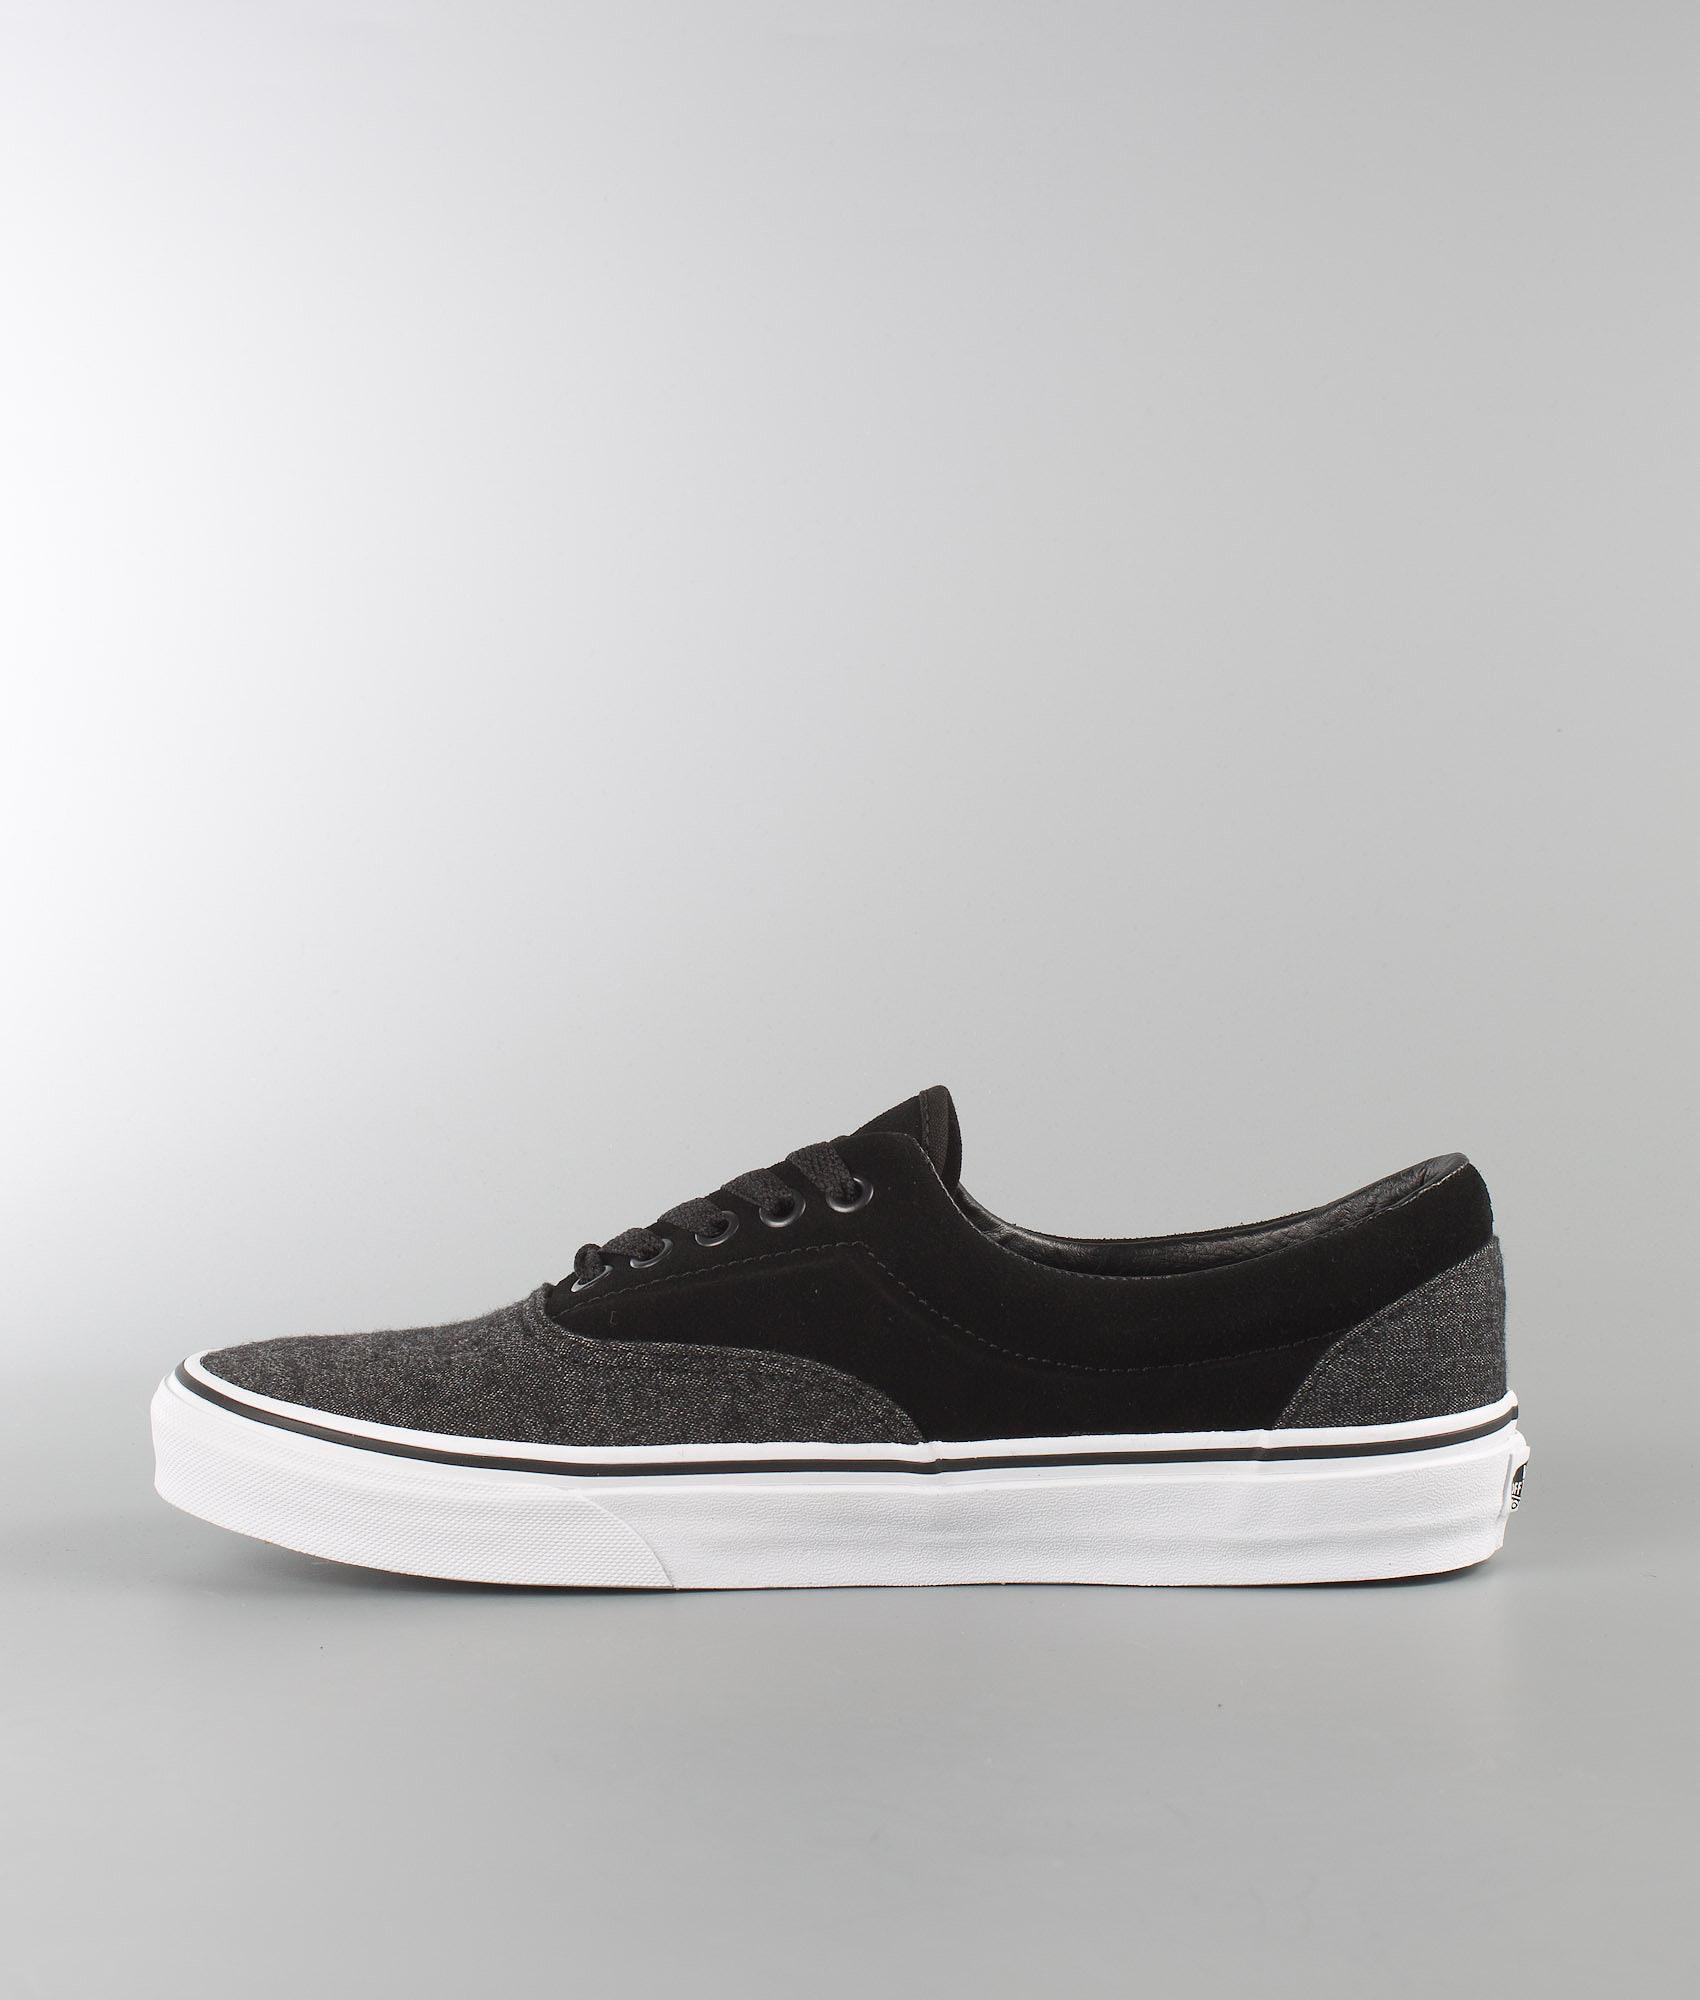 e83b946217def7 Vans Era Shoes (Suede   Suiting) Black - Ridestore.com